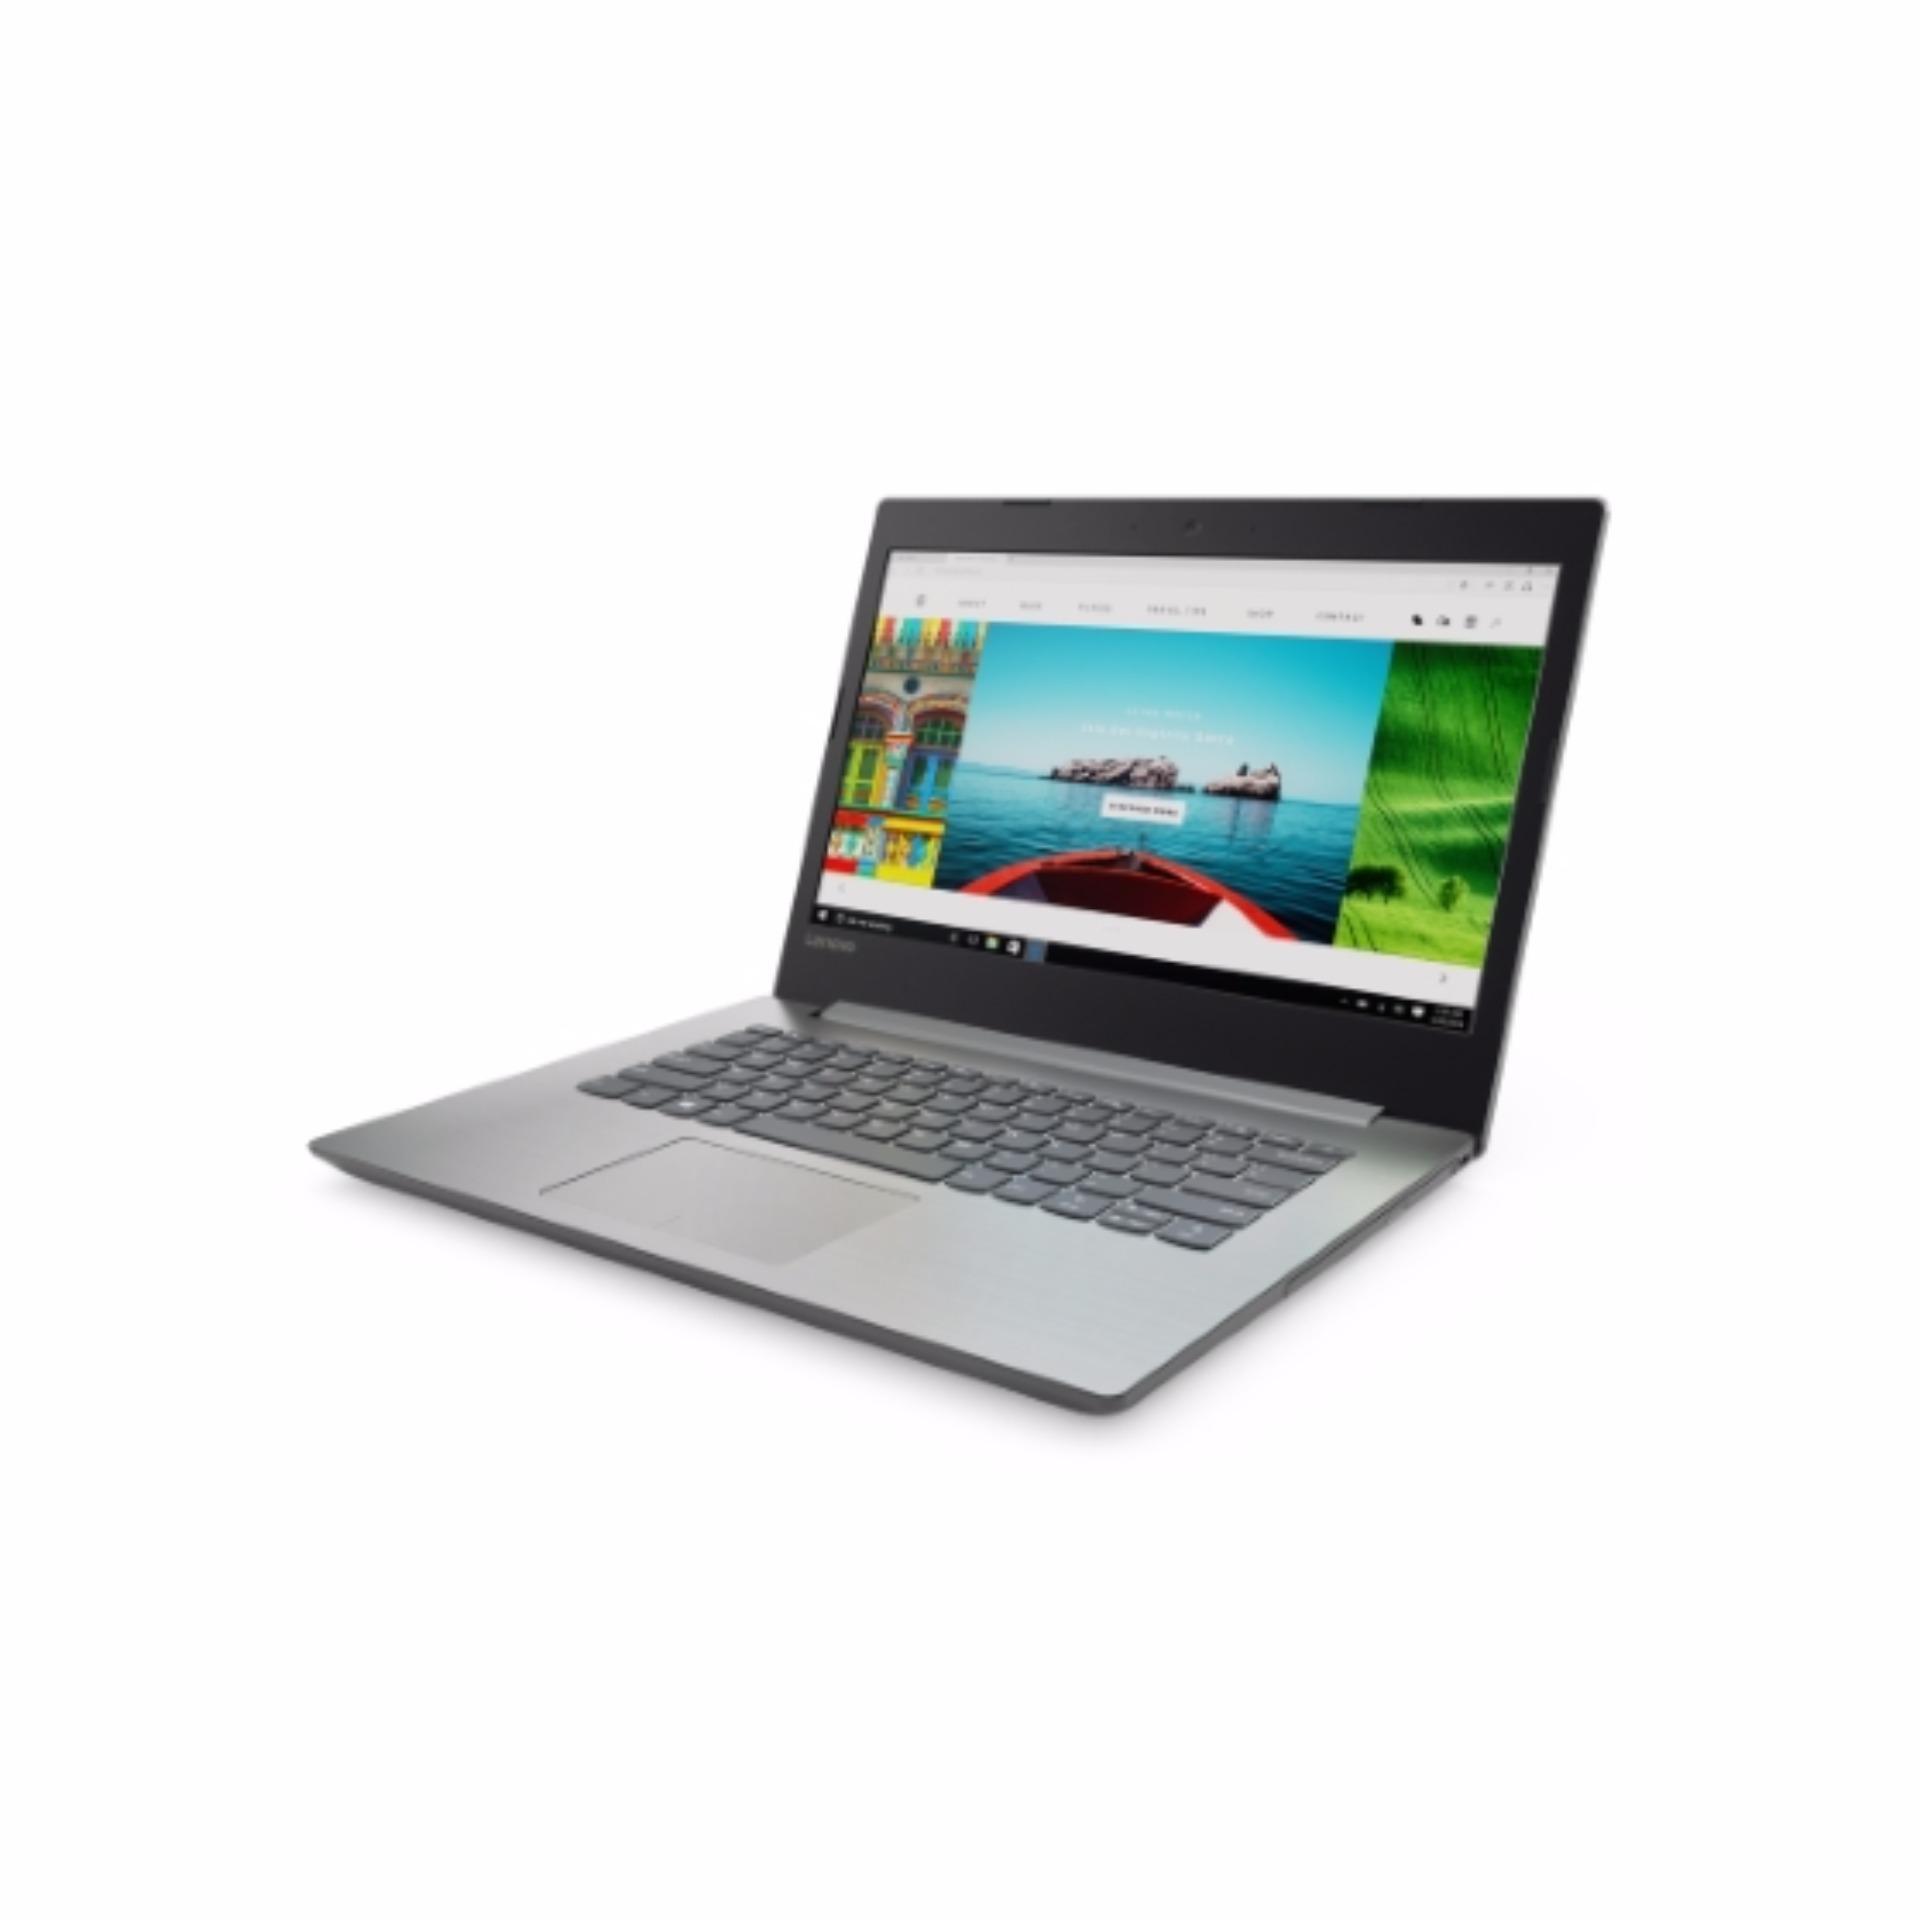 LENOVO IdeaPad 320 14ISK 1BID Platium Gray I3 6006U 4GB 1TB